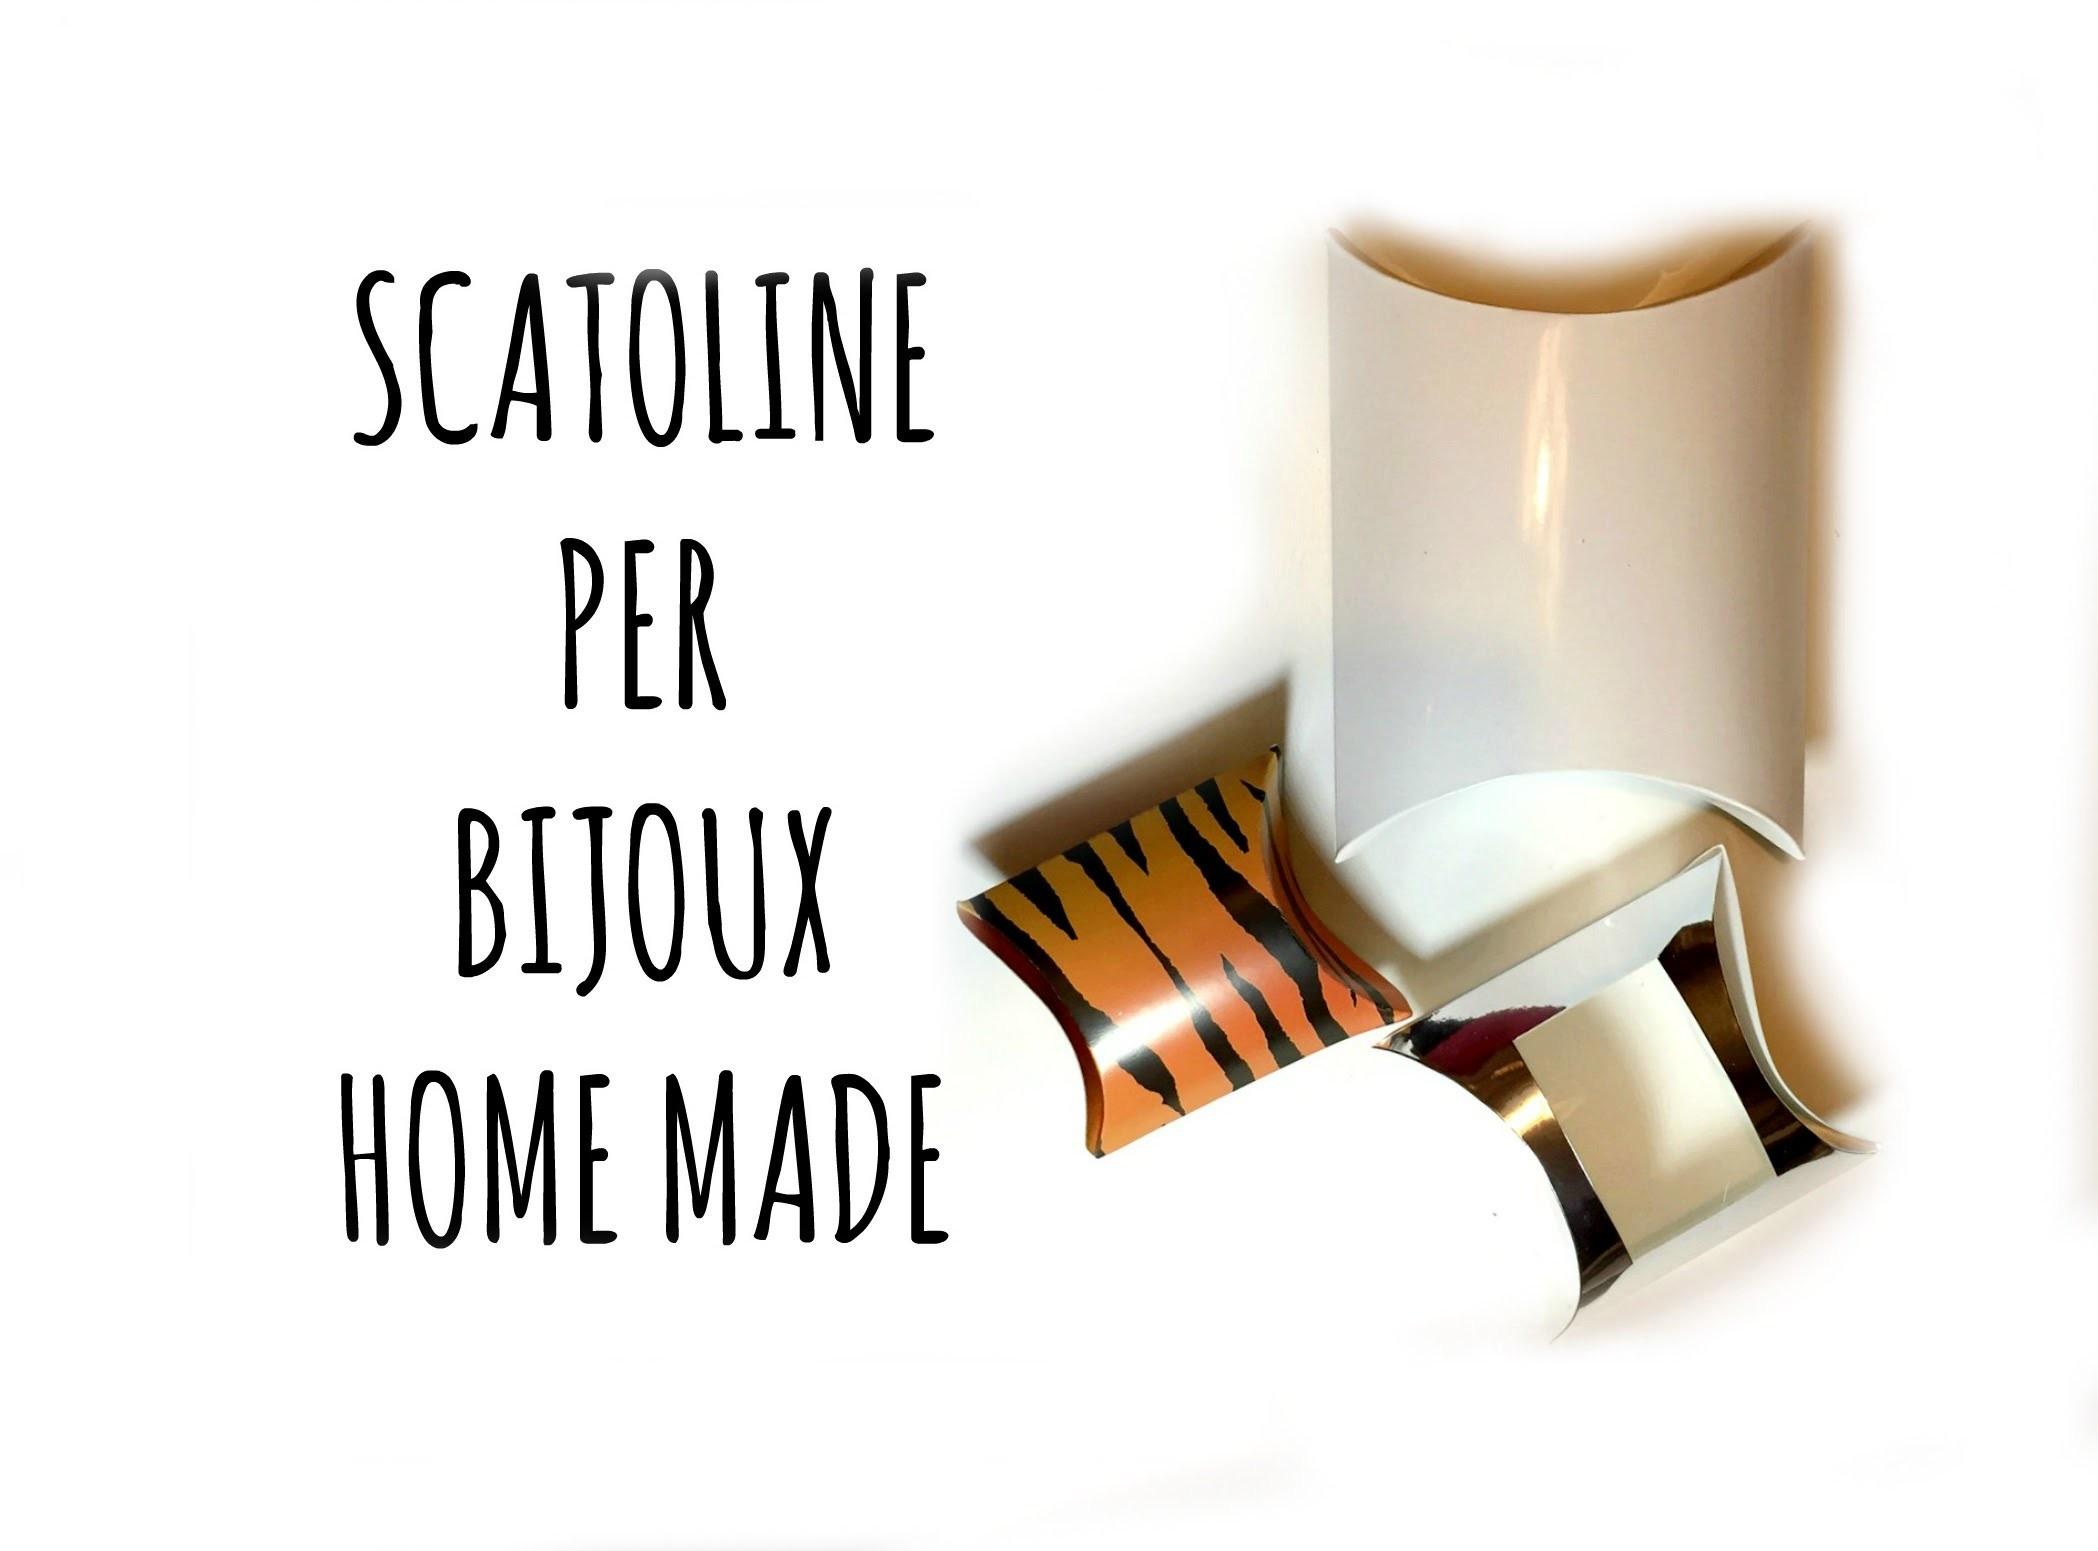 How To SCATOLINE per BIJOUX home made (D.I.Y.) Arte per Te